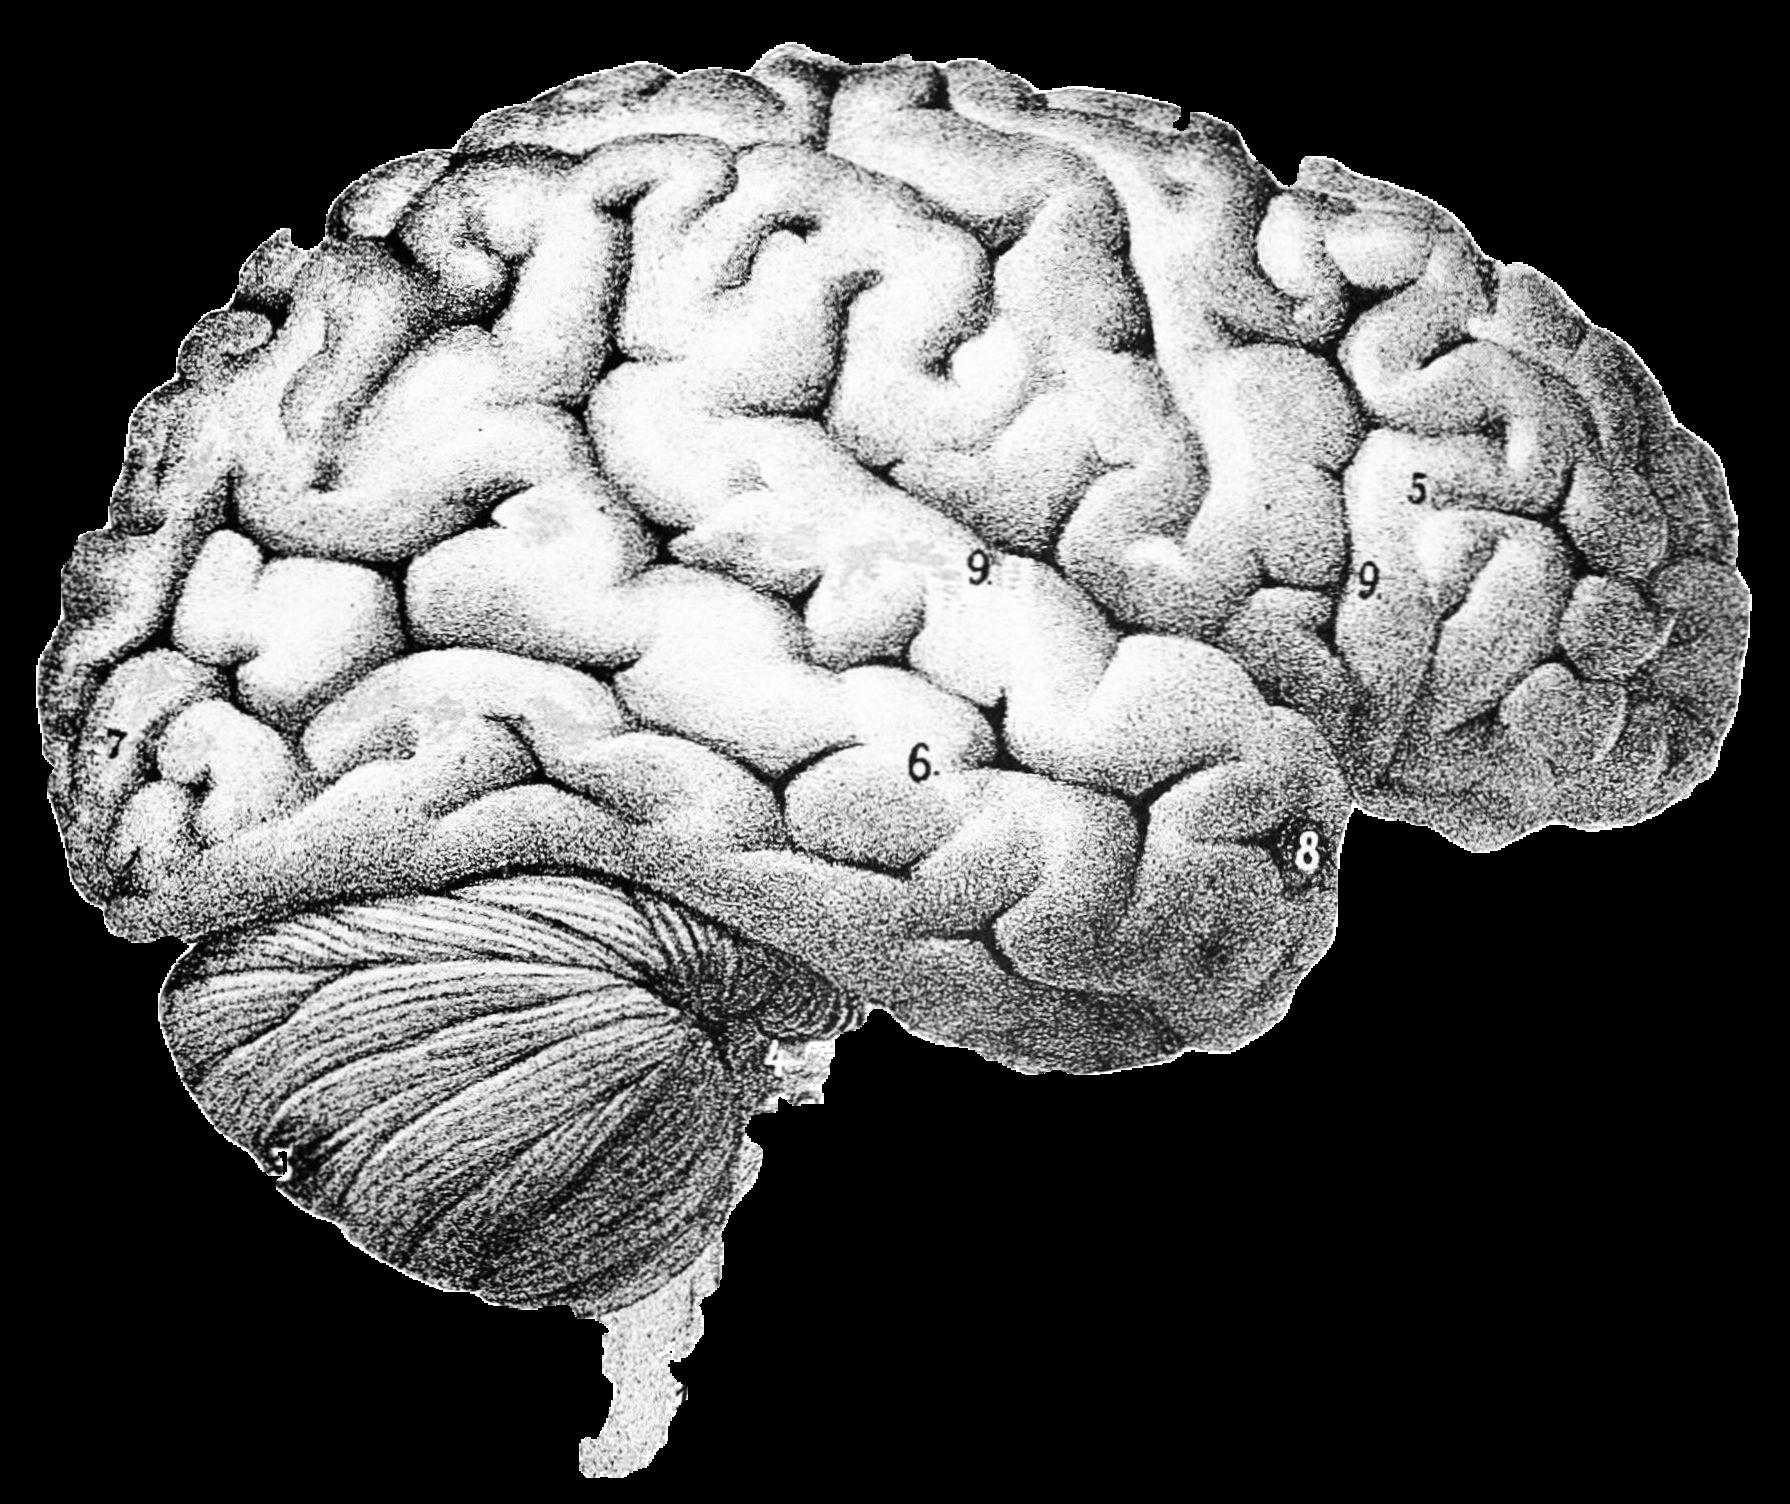 Drawn brain transparent background #8